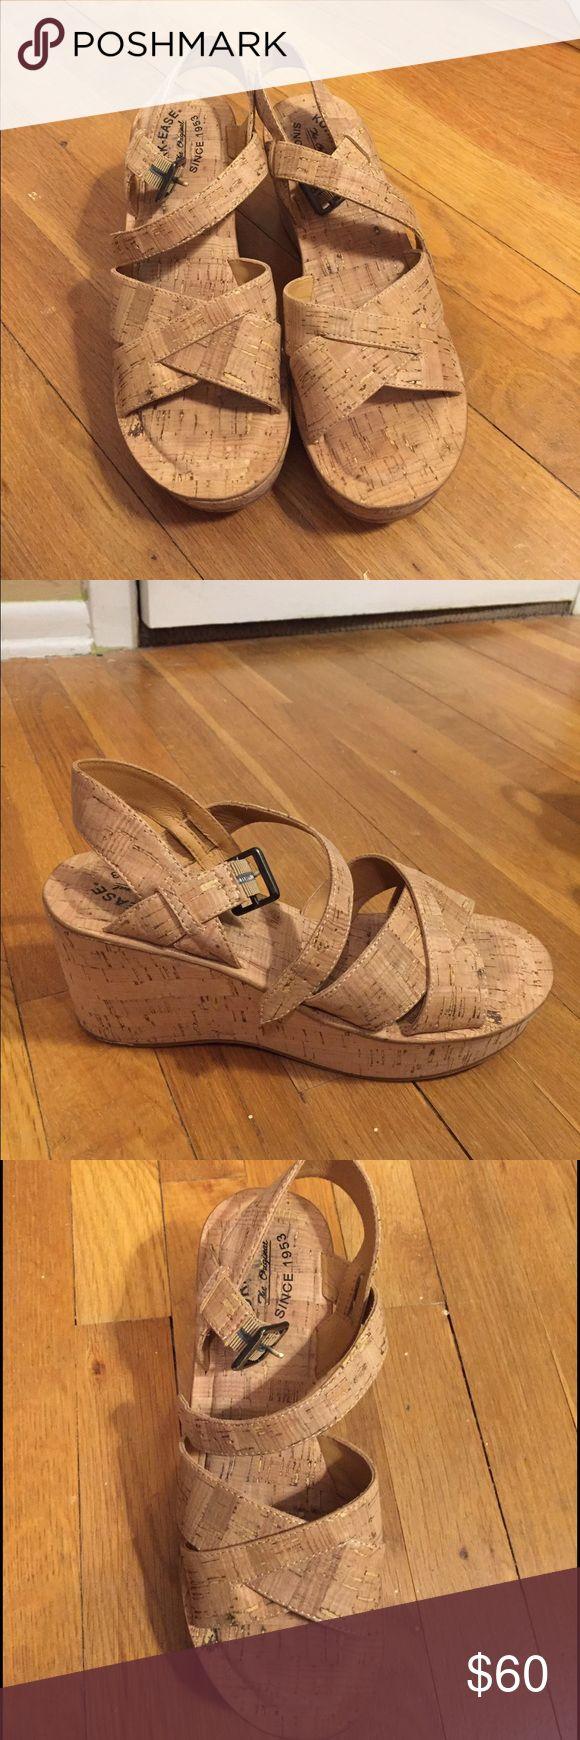 Selling this Kork Ease Ava Natural Cork Wedges on Poshmark! My username is: jenglickman. #shopmycloset #poshmark #fashion #shopping #style #forsale #Kork Ease #Shoes